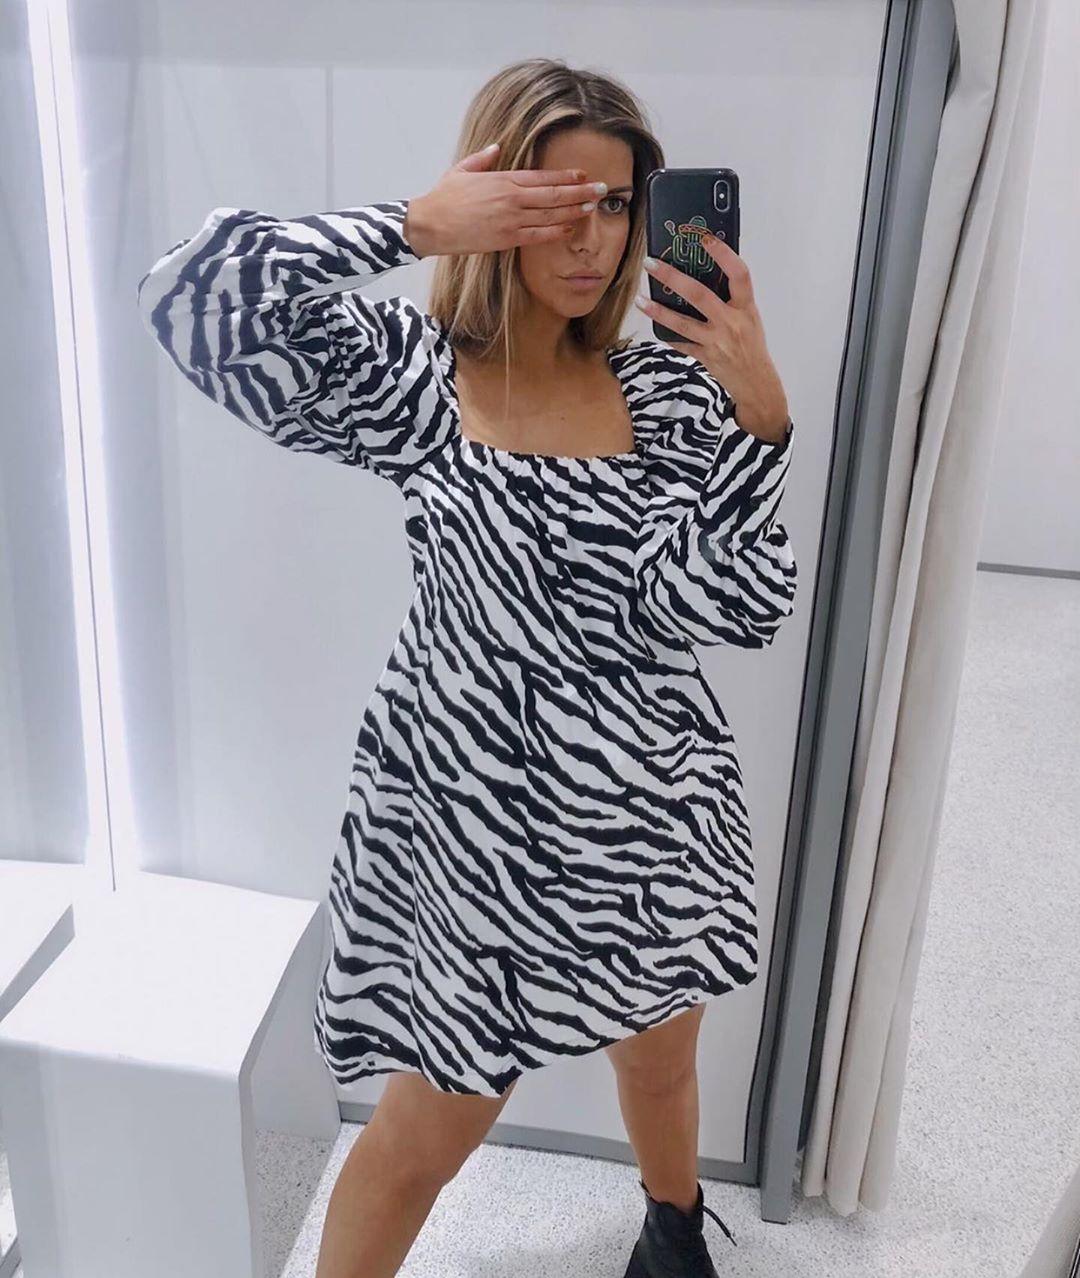 robe en popeline à imprimé animalier de Zara sur zara.outfits